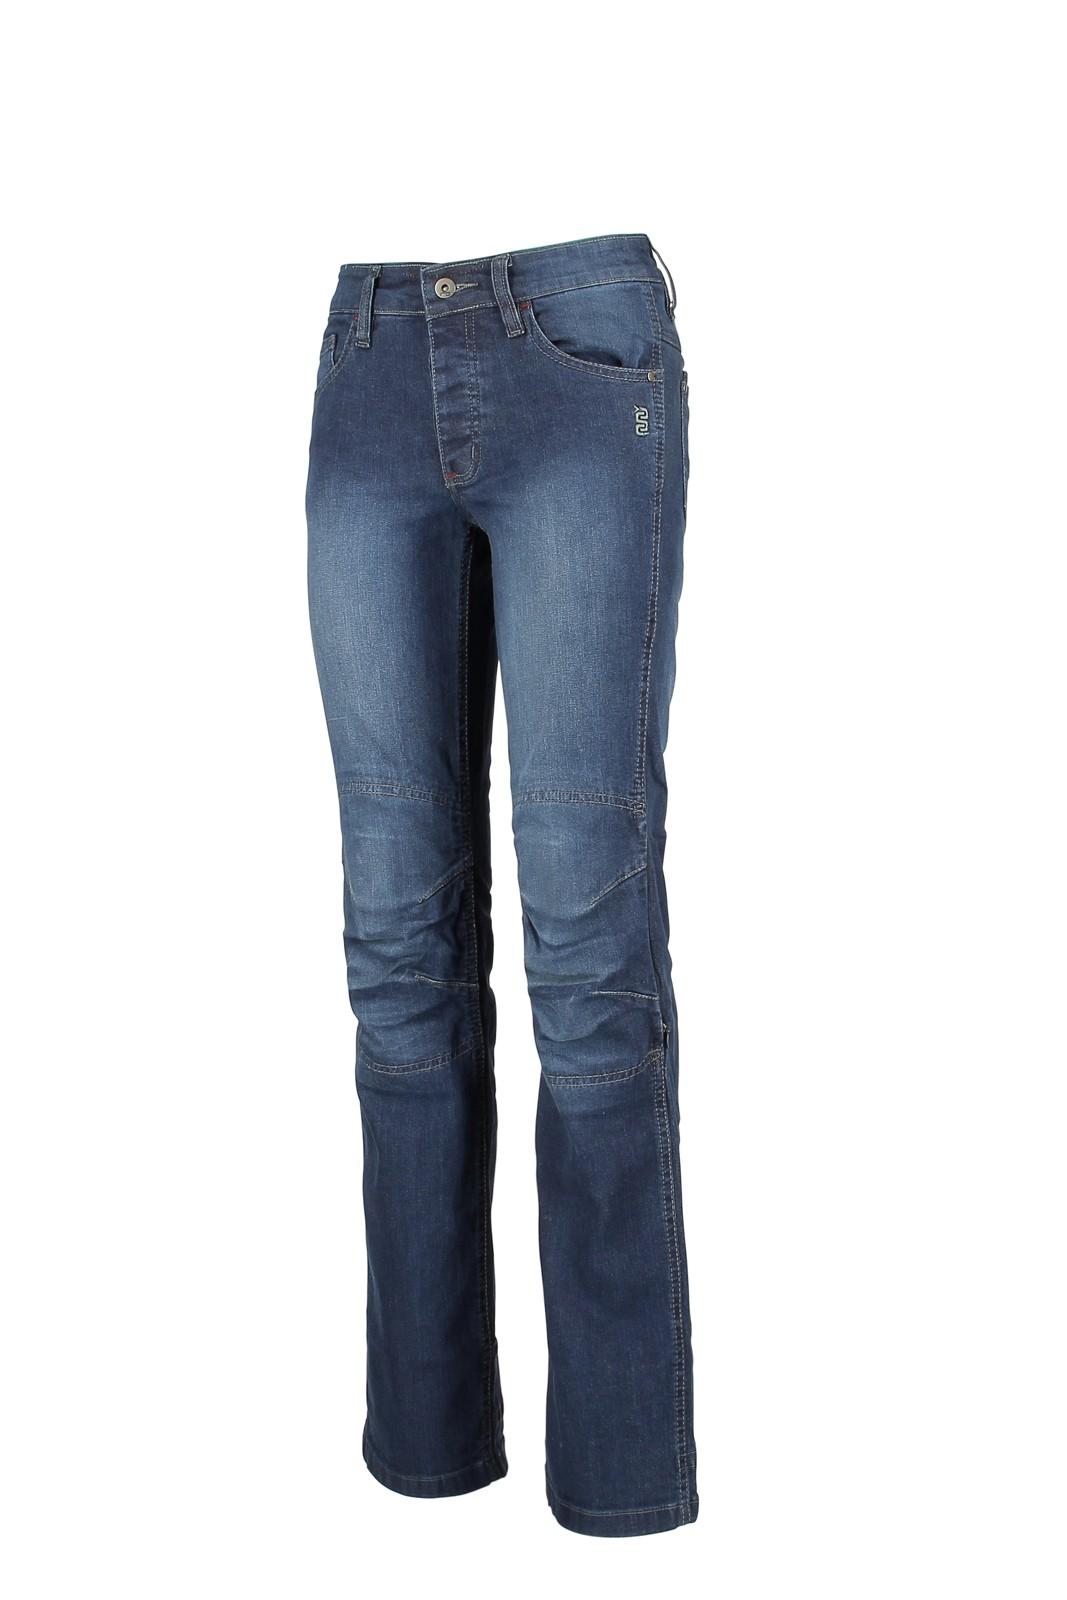 Pantalón OJ Venere Mujer